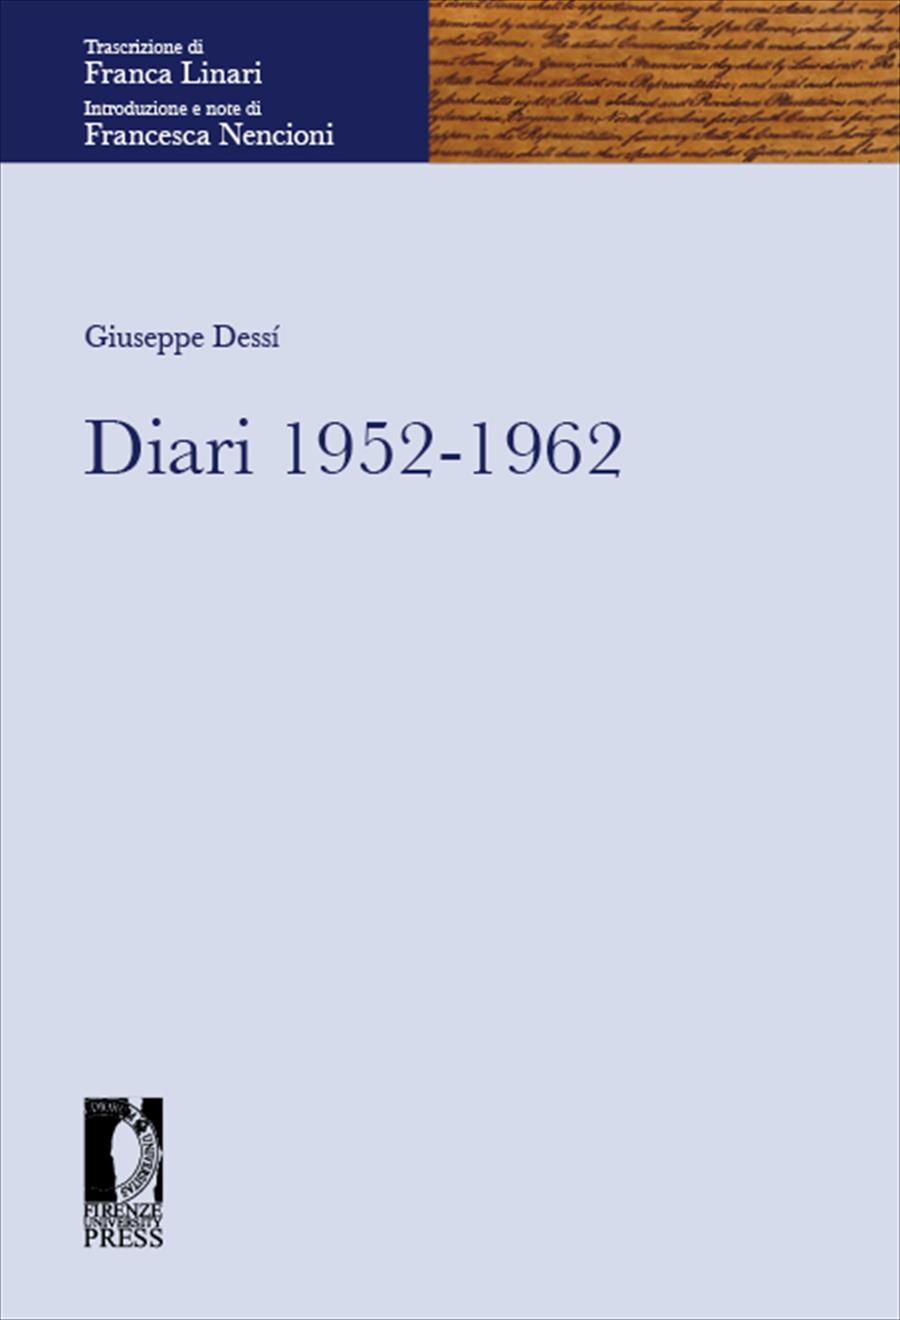 Diari 1952-1962